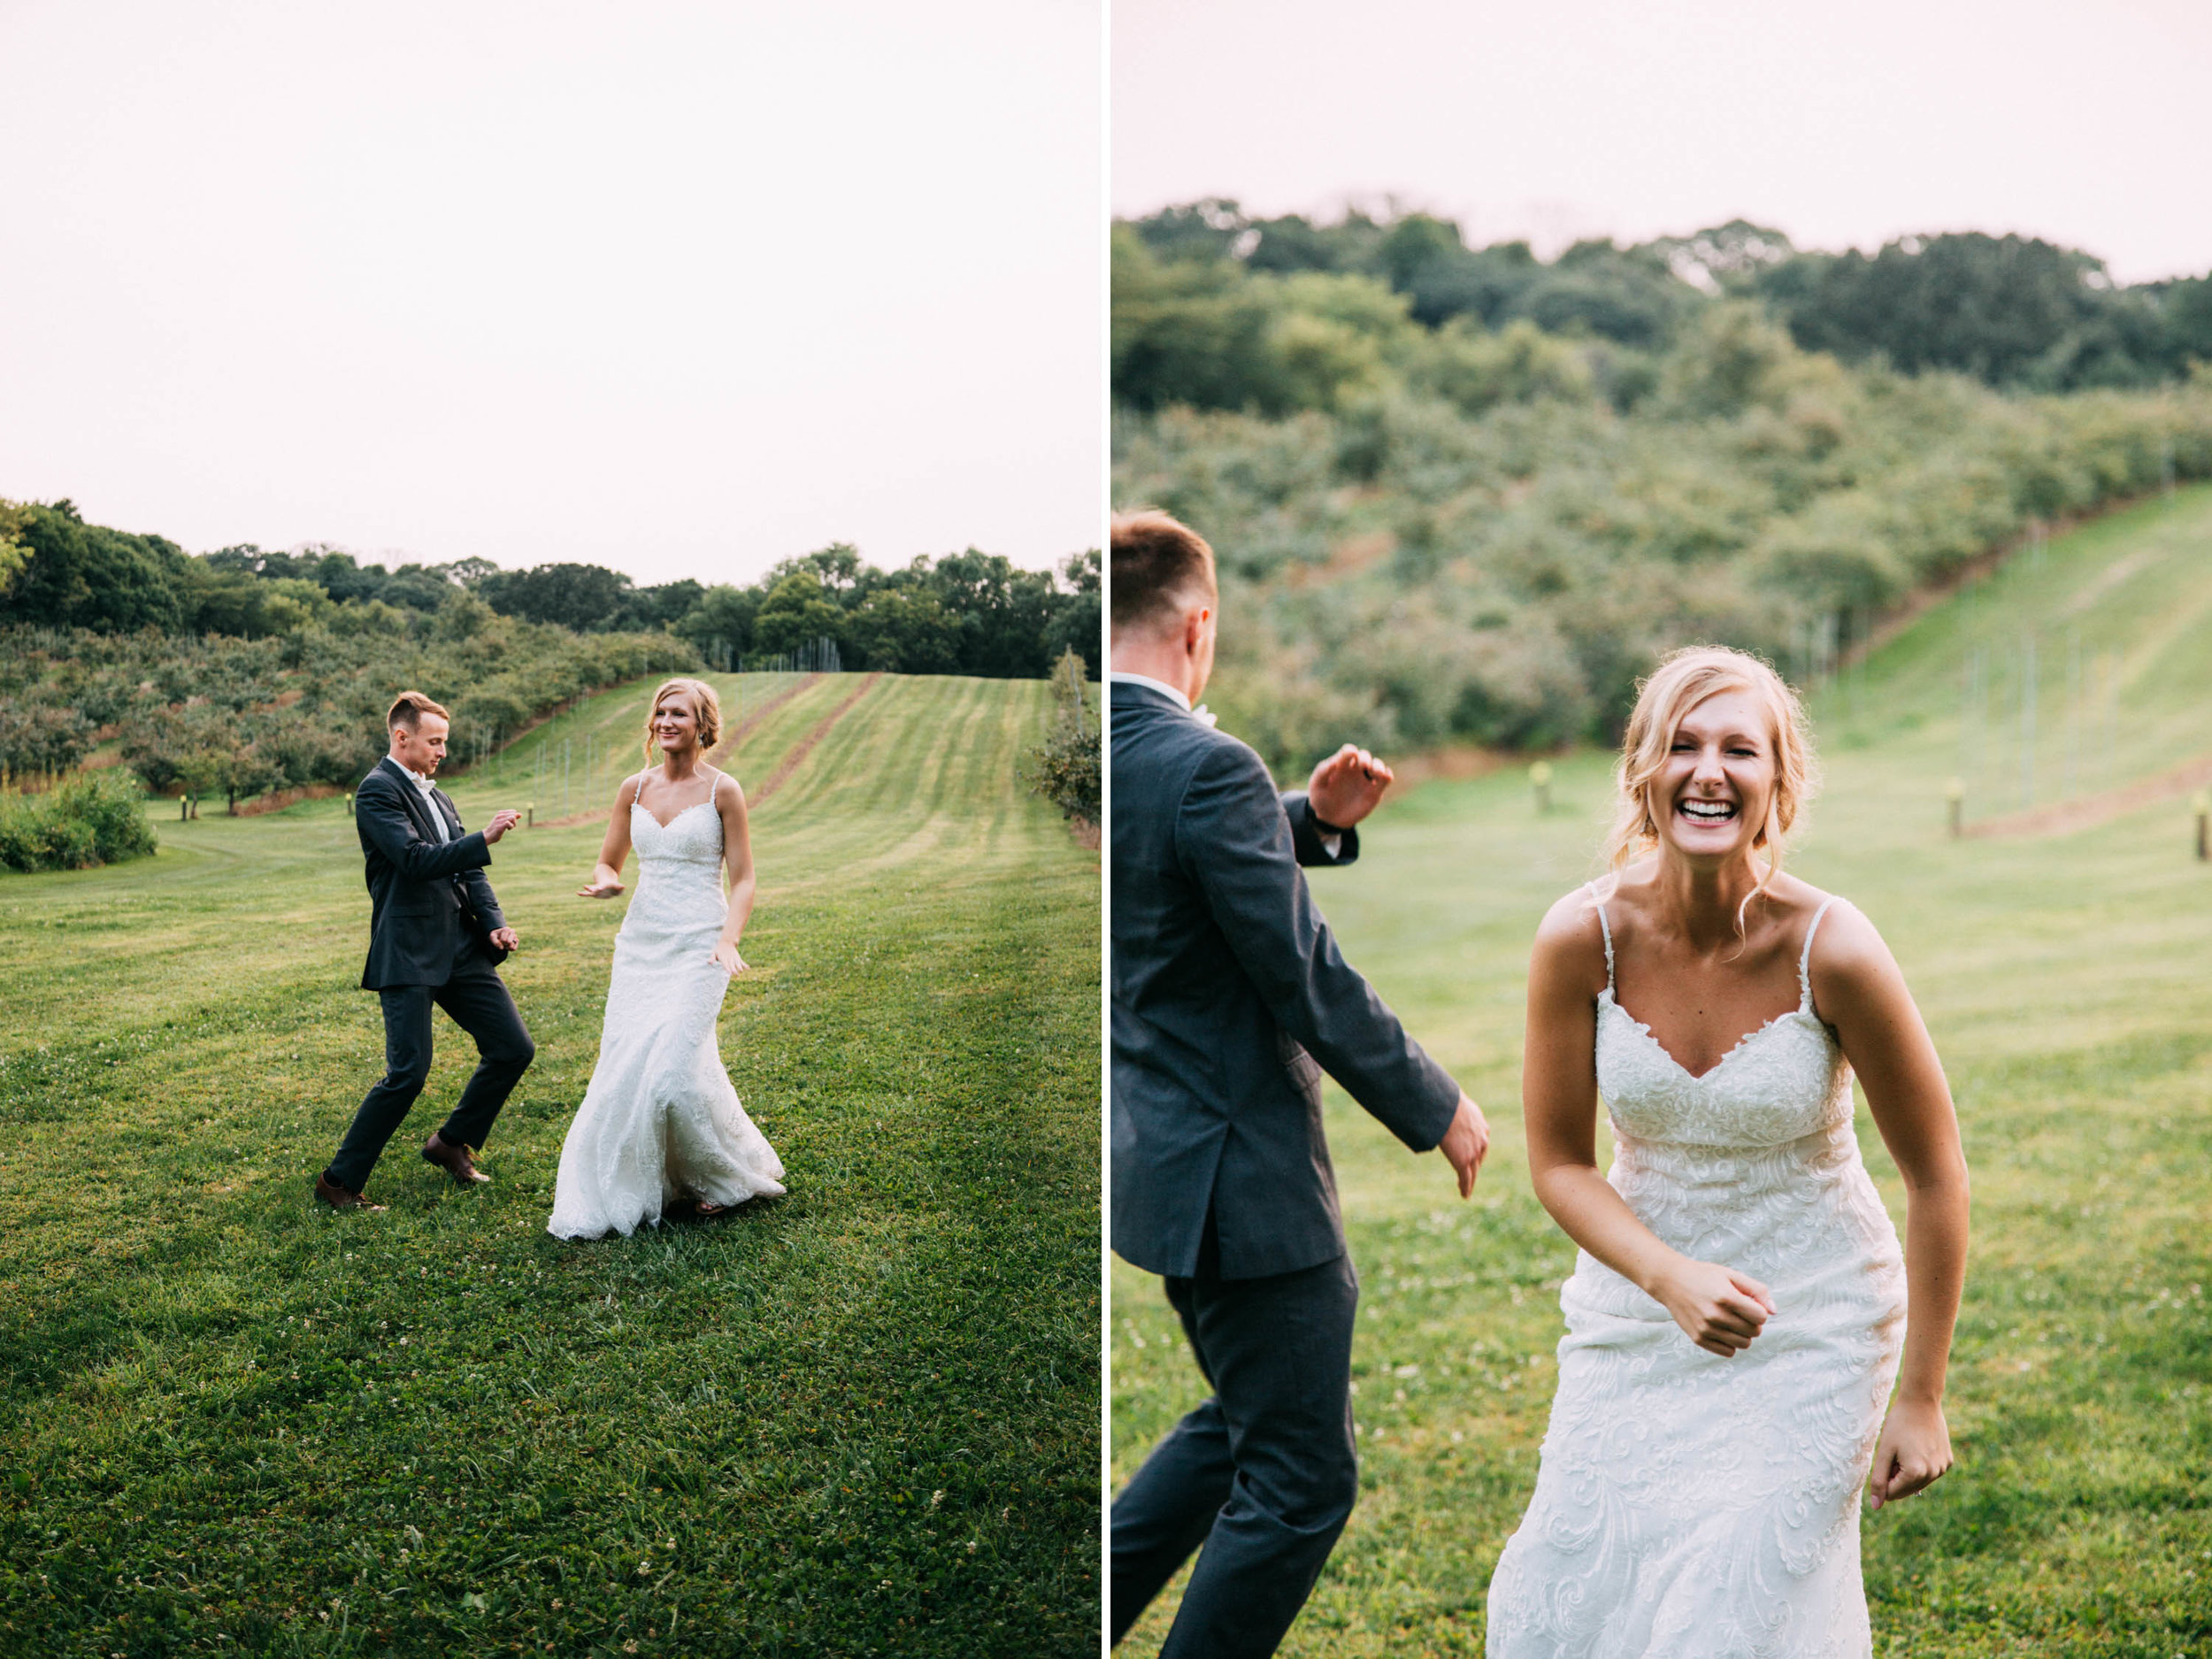 36-Minnetonka Orchards Wedding Ashley Bryce Blog.jpg